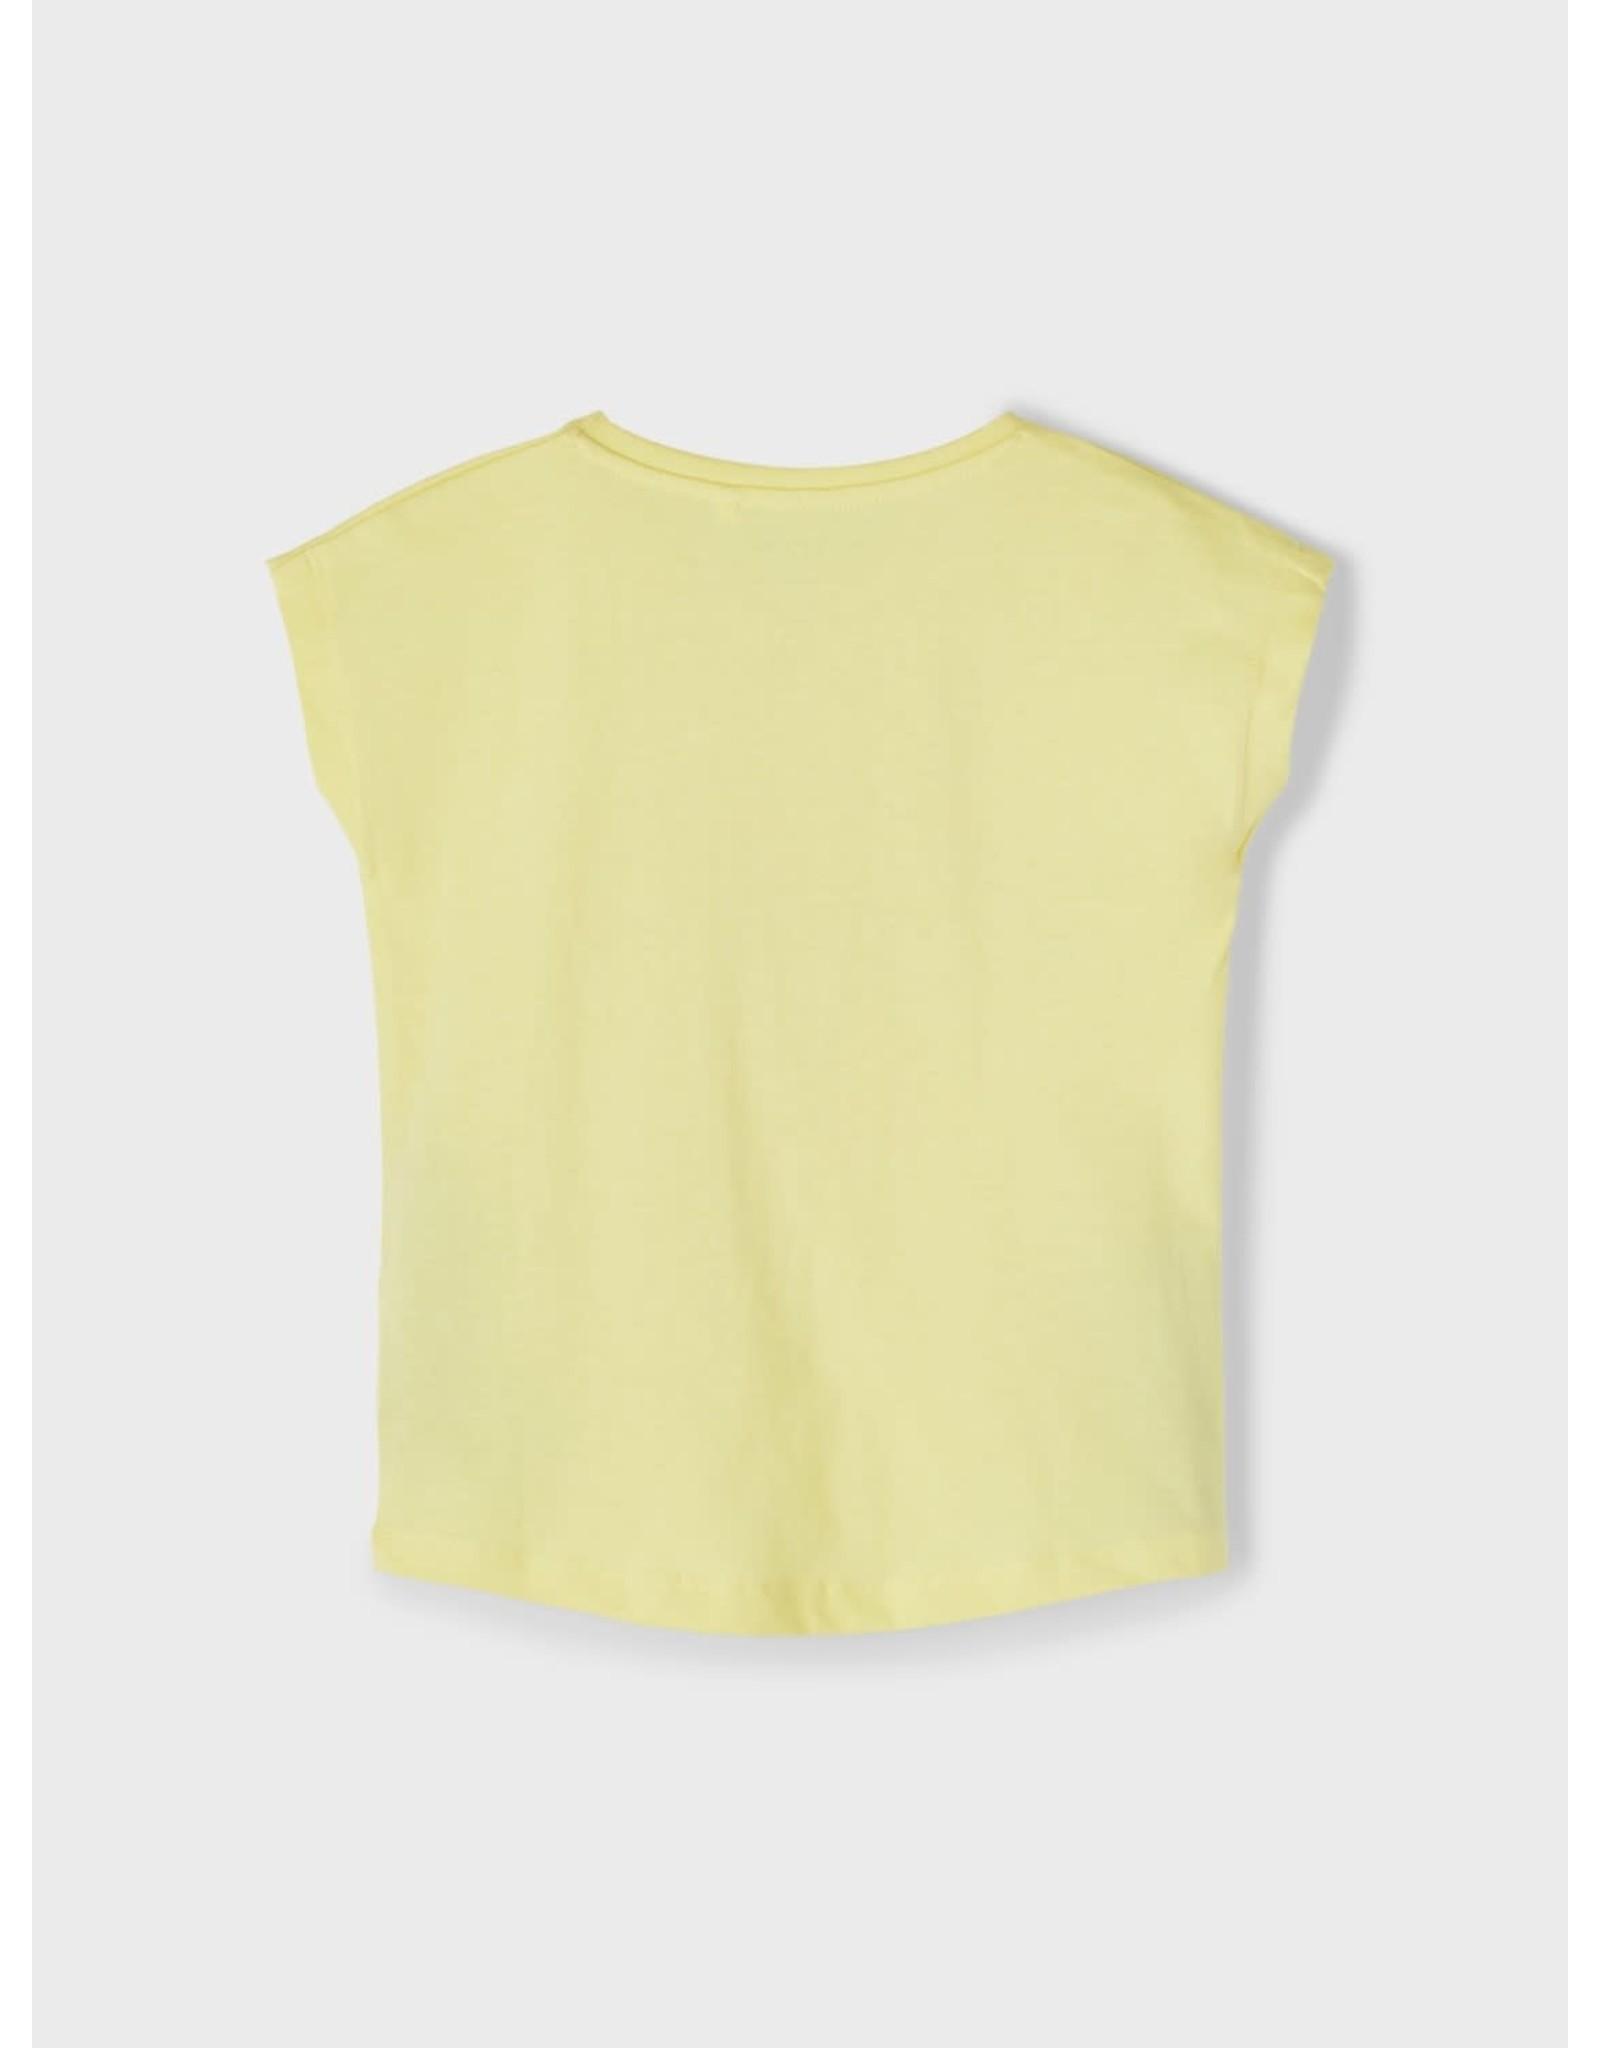 Name It Basis gele bedrukte t-shirt voor kleine meisjes